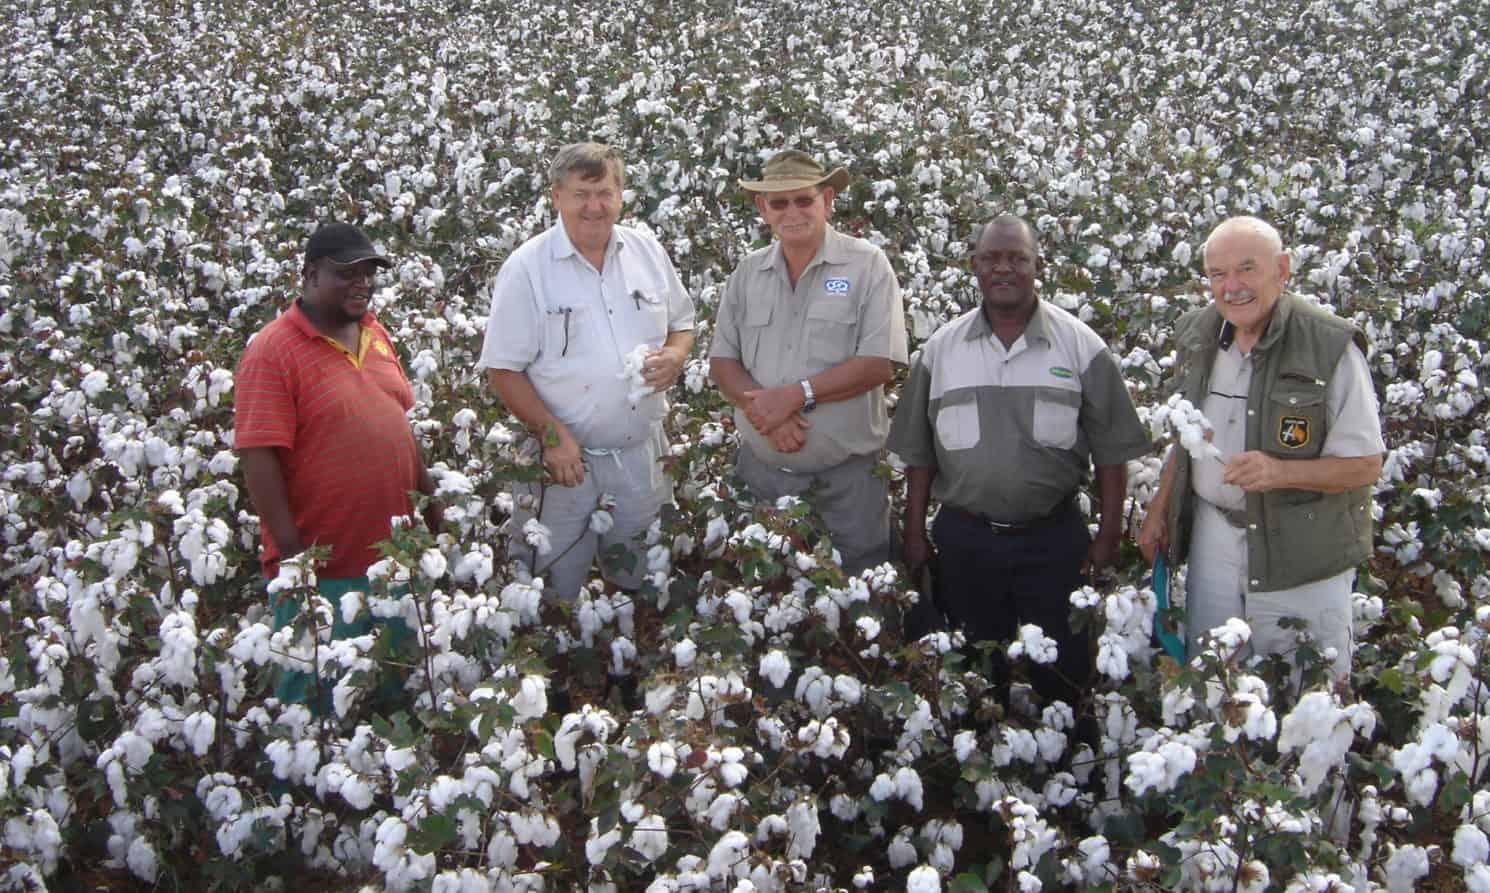 Award winning cotton farmer Frans Khambi Malela started farming with cotton in 2001.